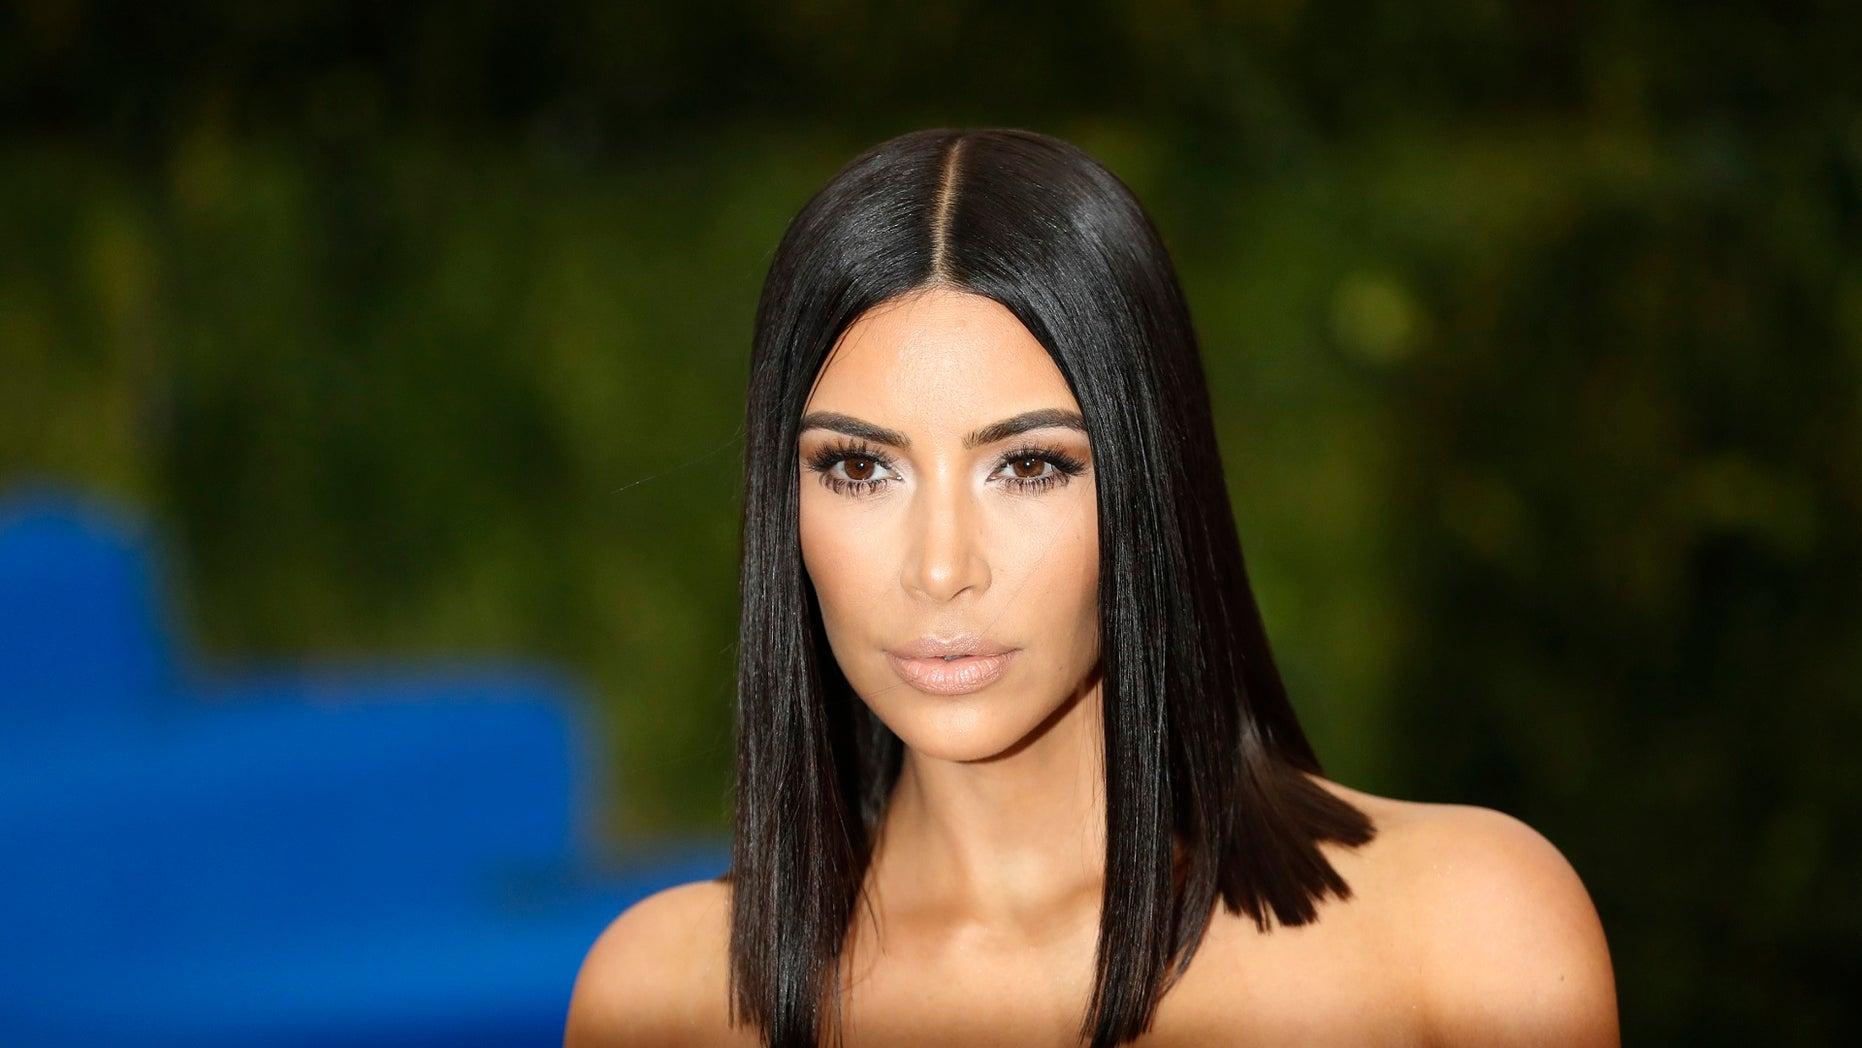 A Message of Thanks to Kim Kardashian for Those Big Post-Baby Reveal Photos